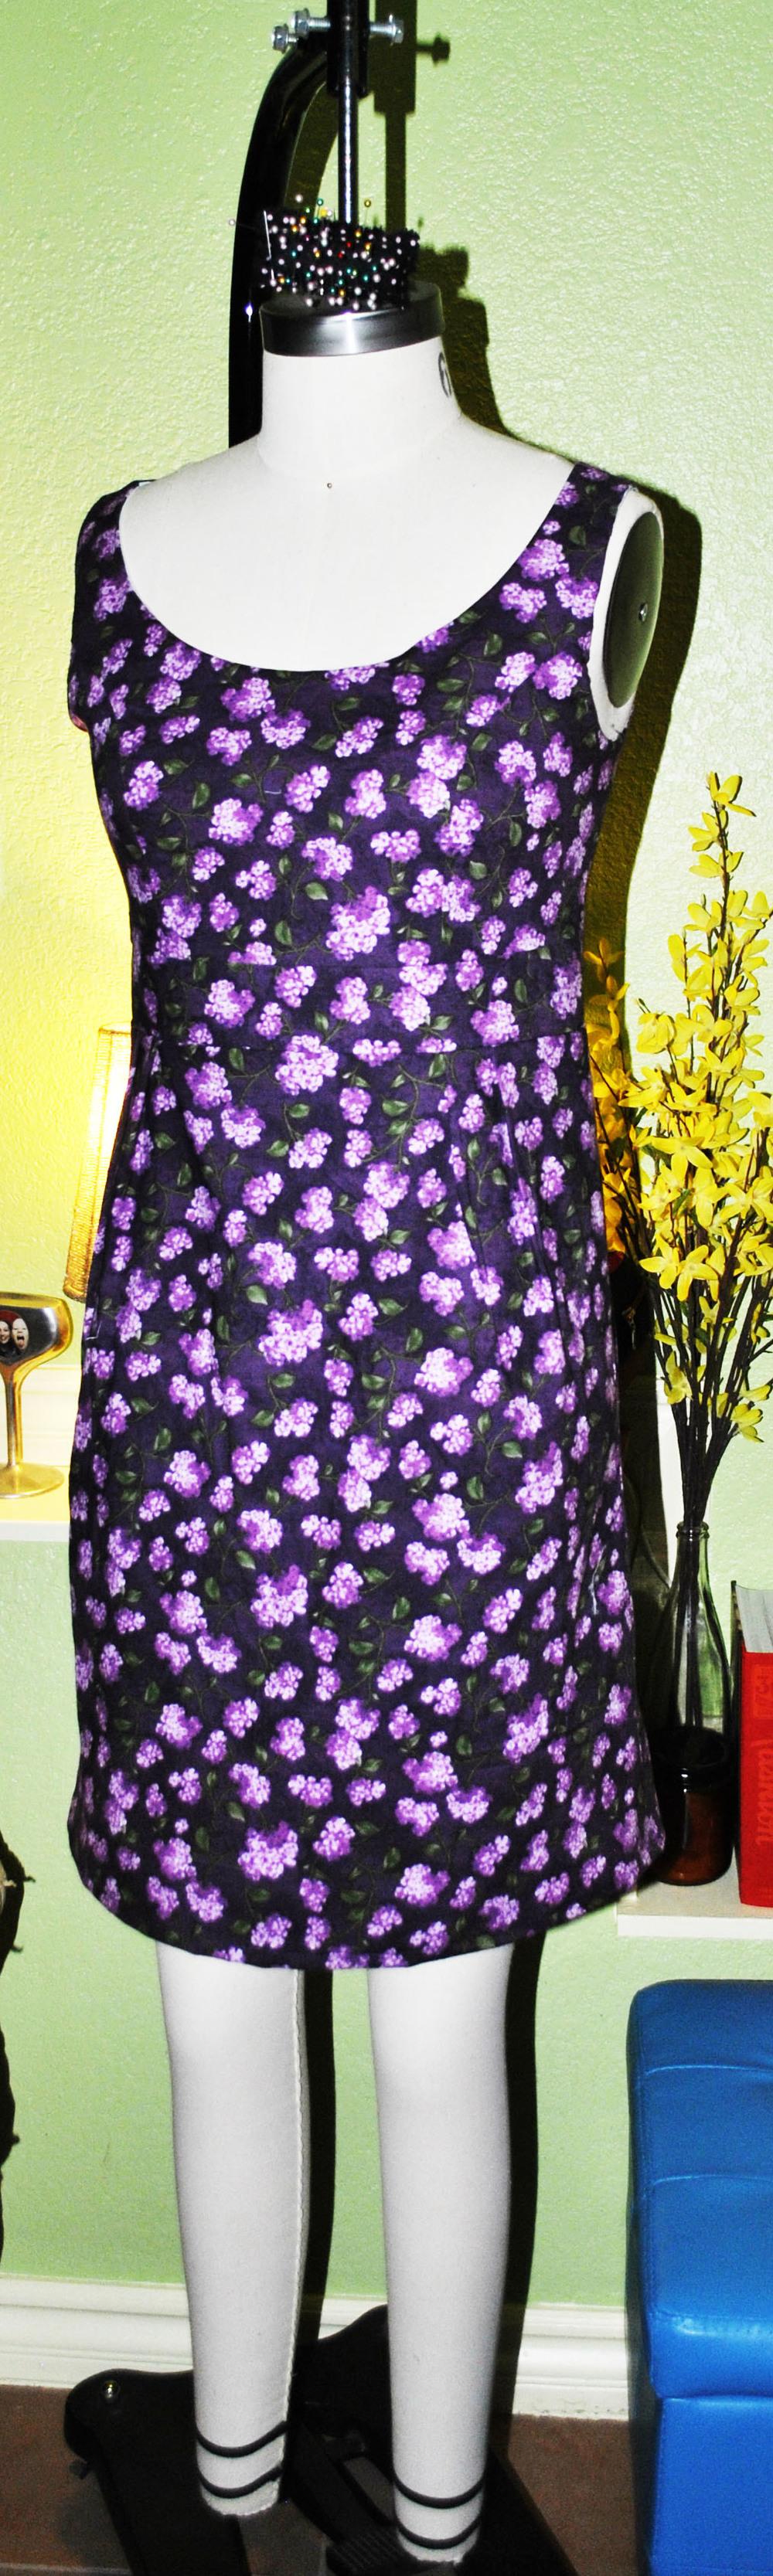 Lilac Dress.jpg